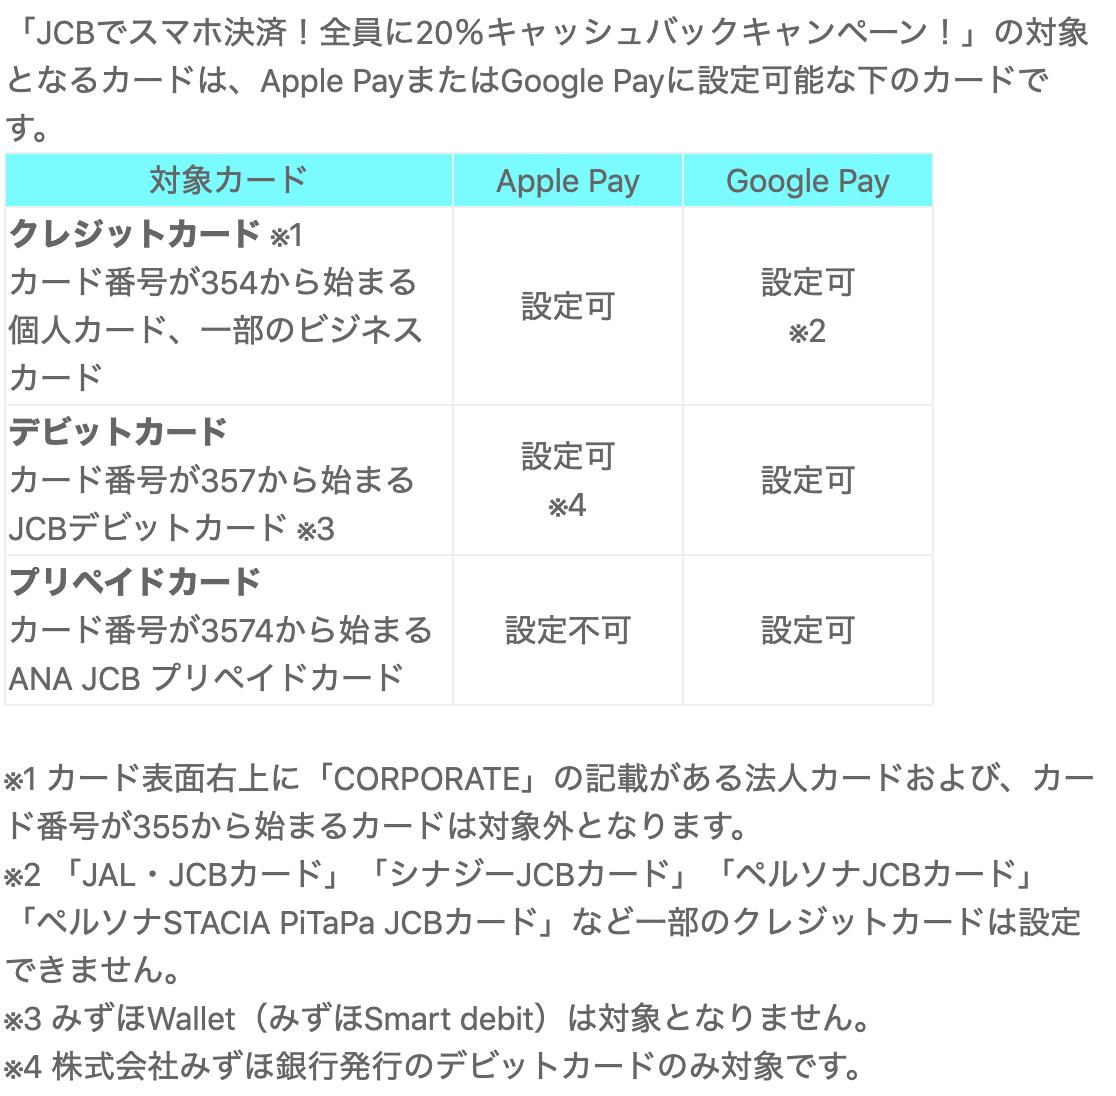 f:id:hardshopper:20191005022051p:plain